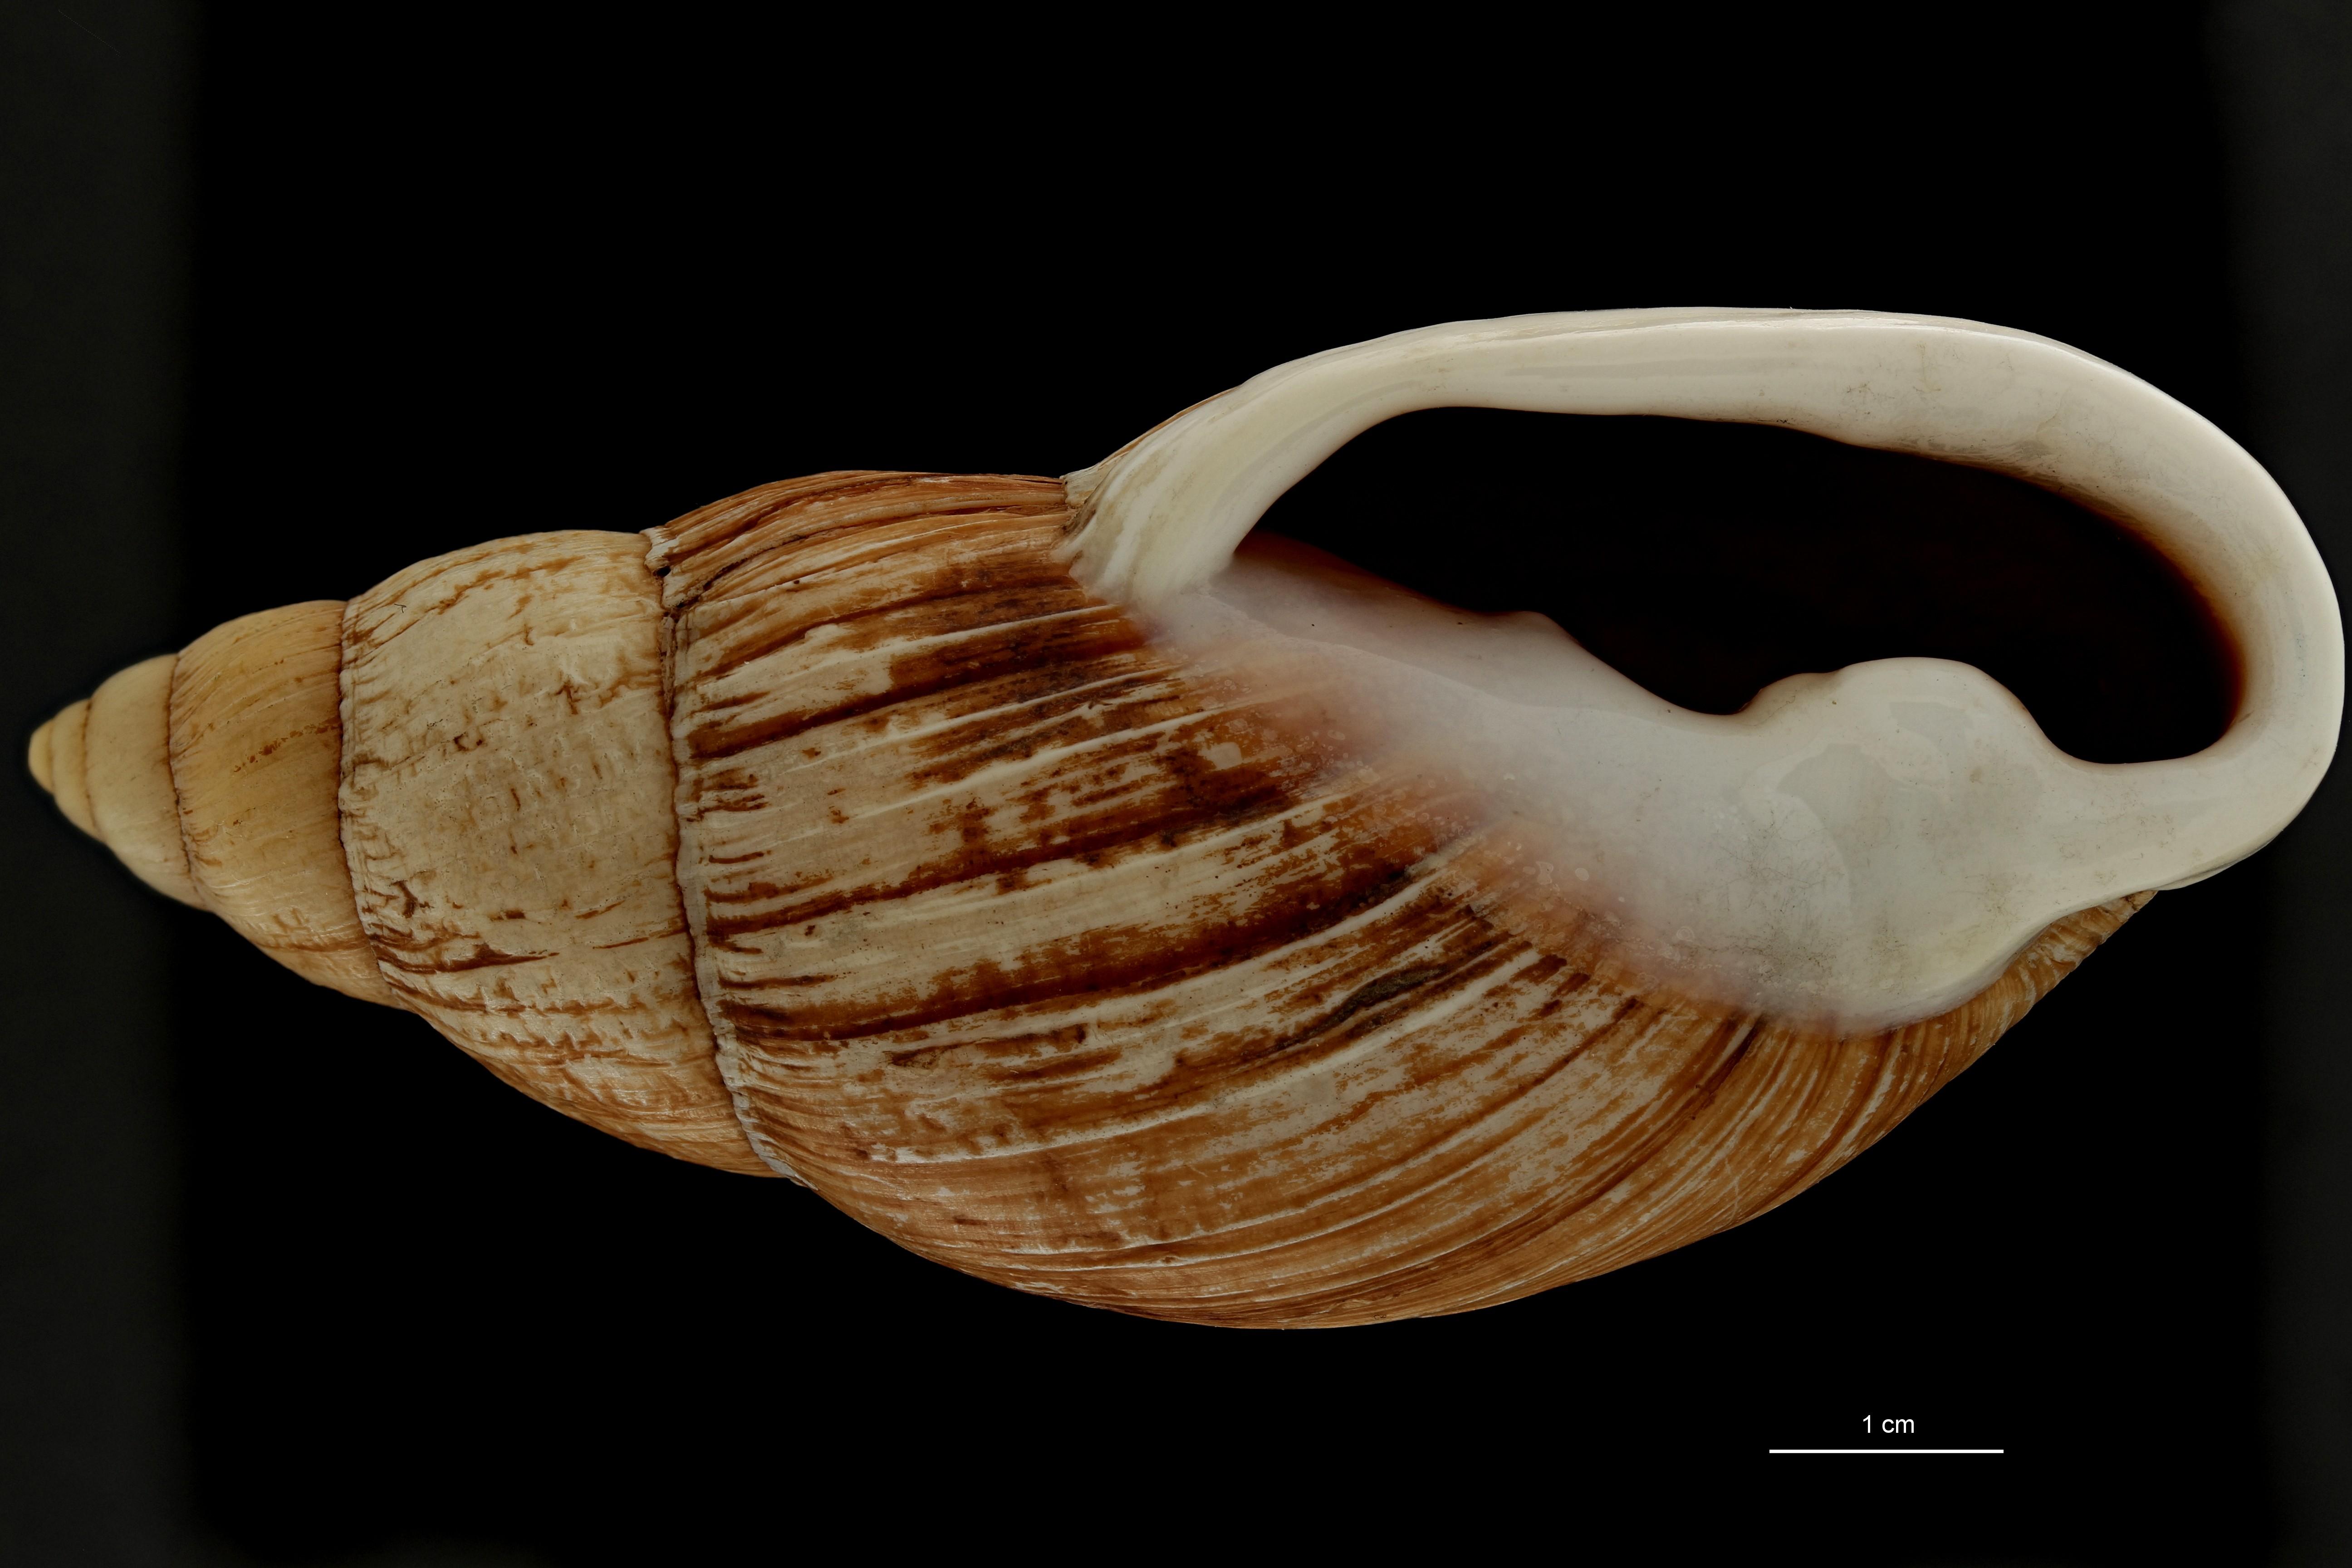 BE-RBINS-INV MT 702 Placostylus porphyrostomus var. elata Type V ZS PMax Scaled.jpg